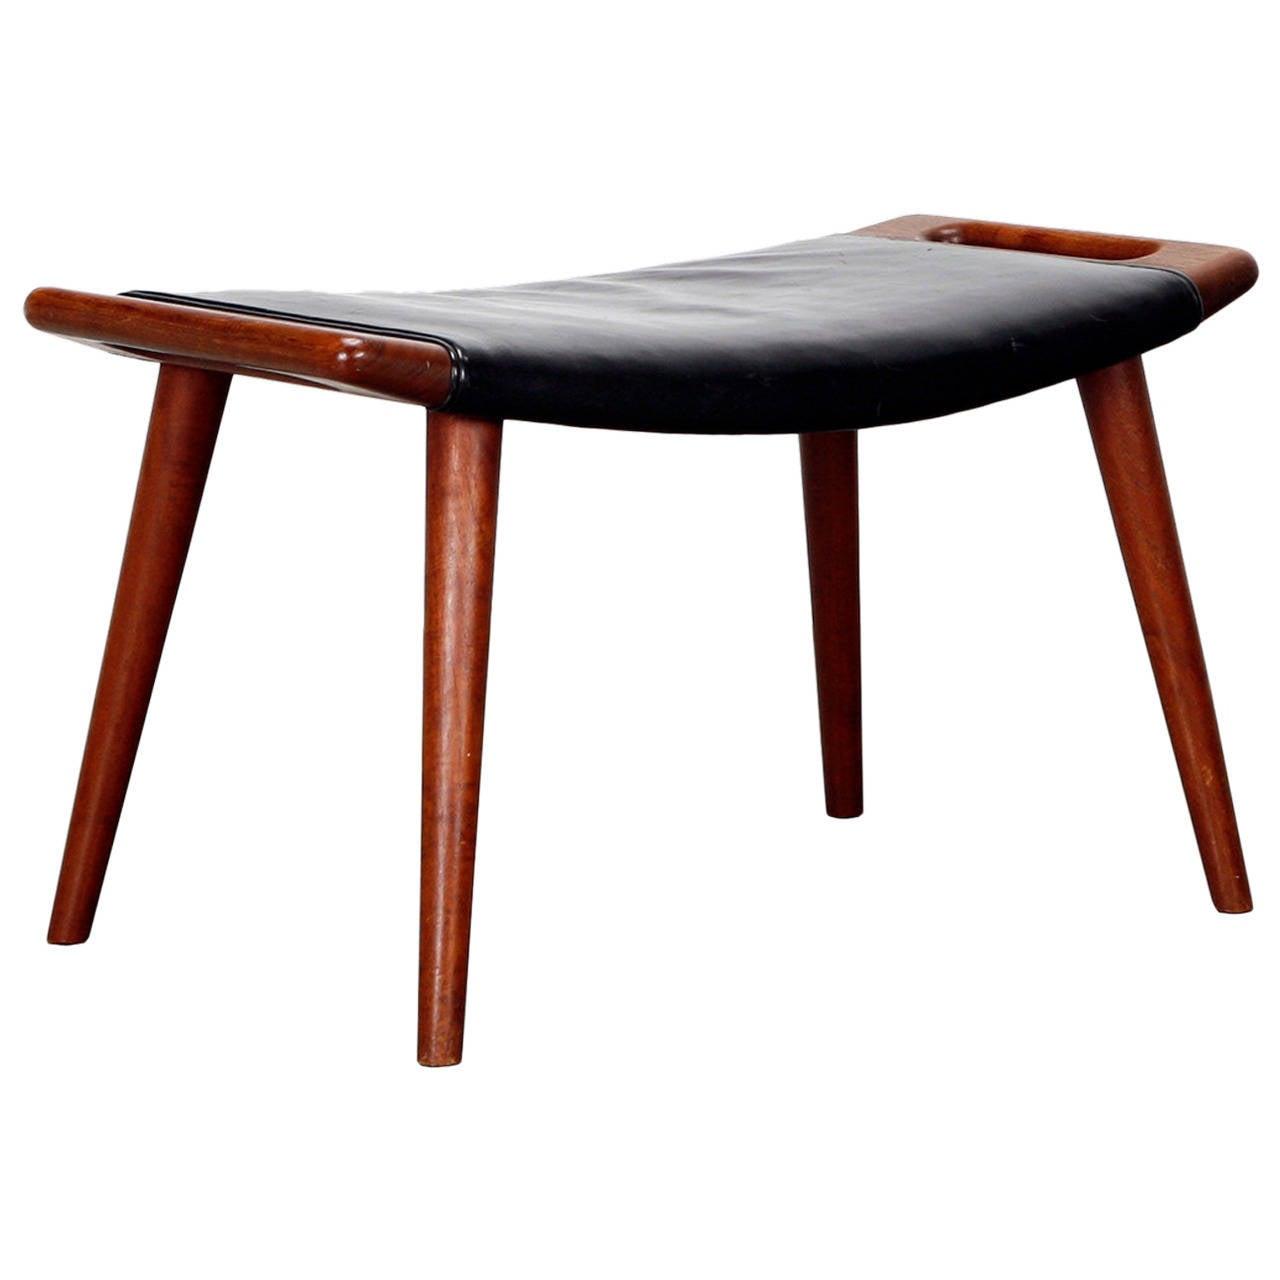 stool by hans wegner at 1stdibs. Black Bedroom Furniture Sets. Home Design Ideas